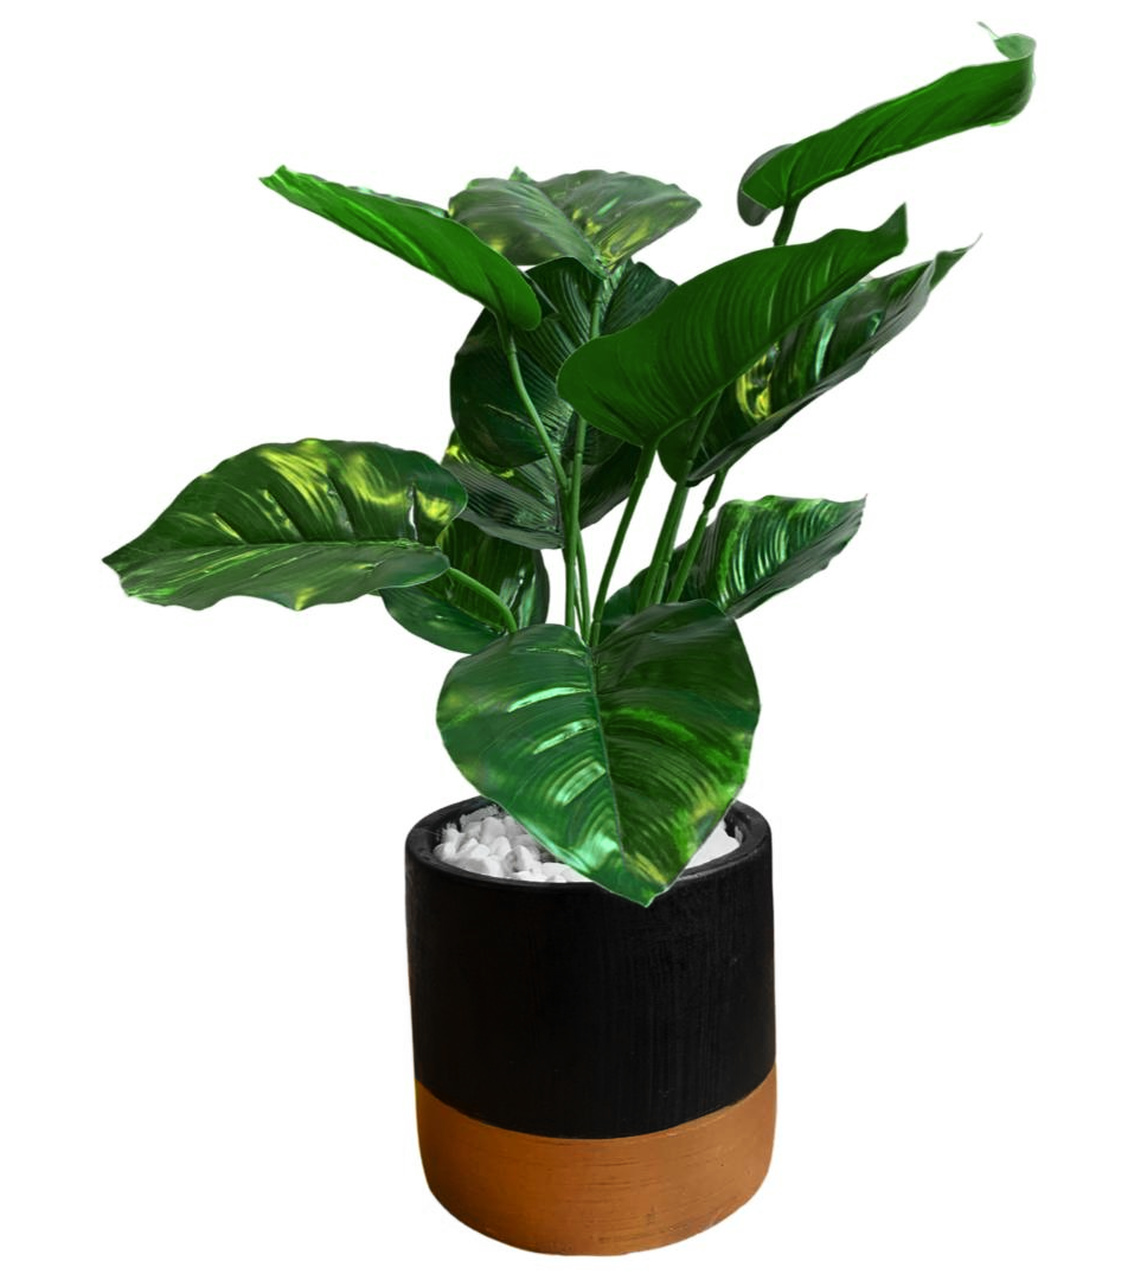 Planta Artificial Decorativa Calathea